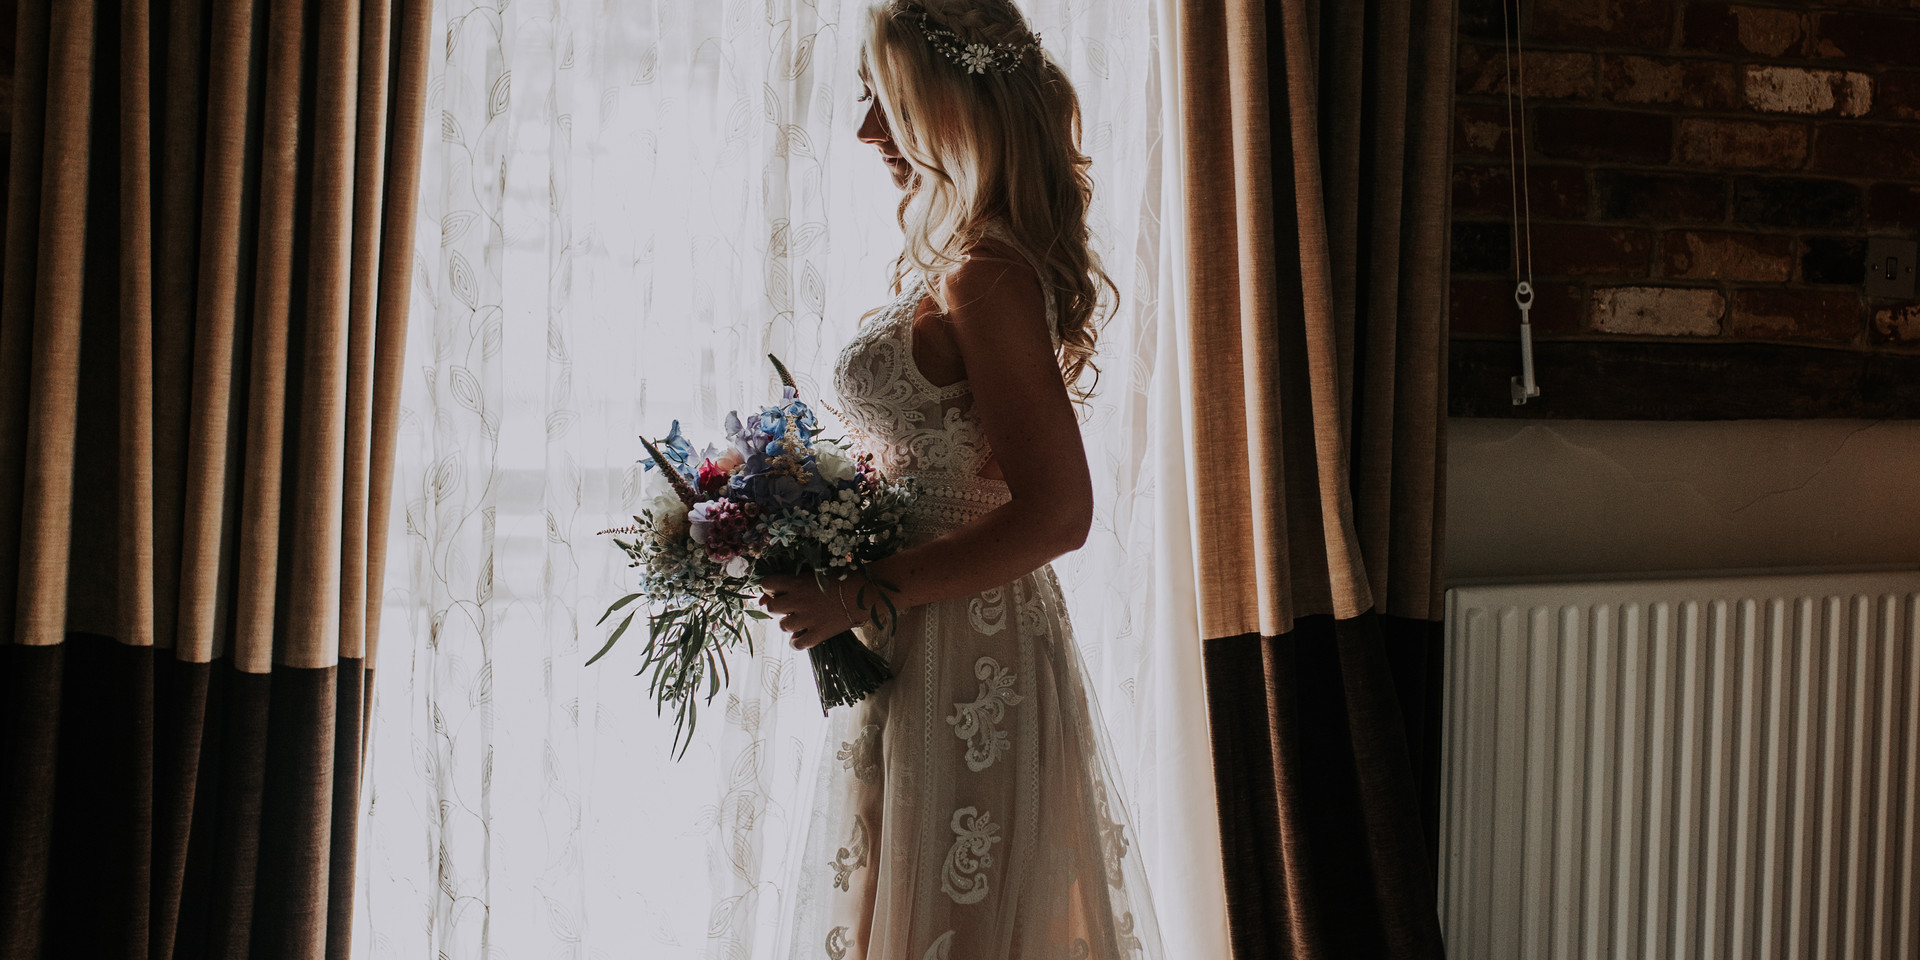 Bride at the windo at Riverdale Barn